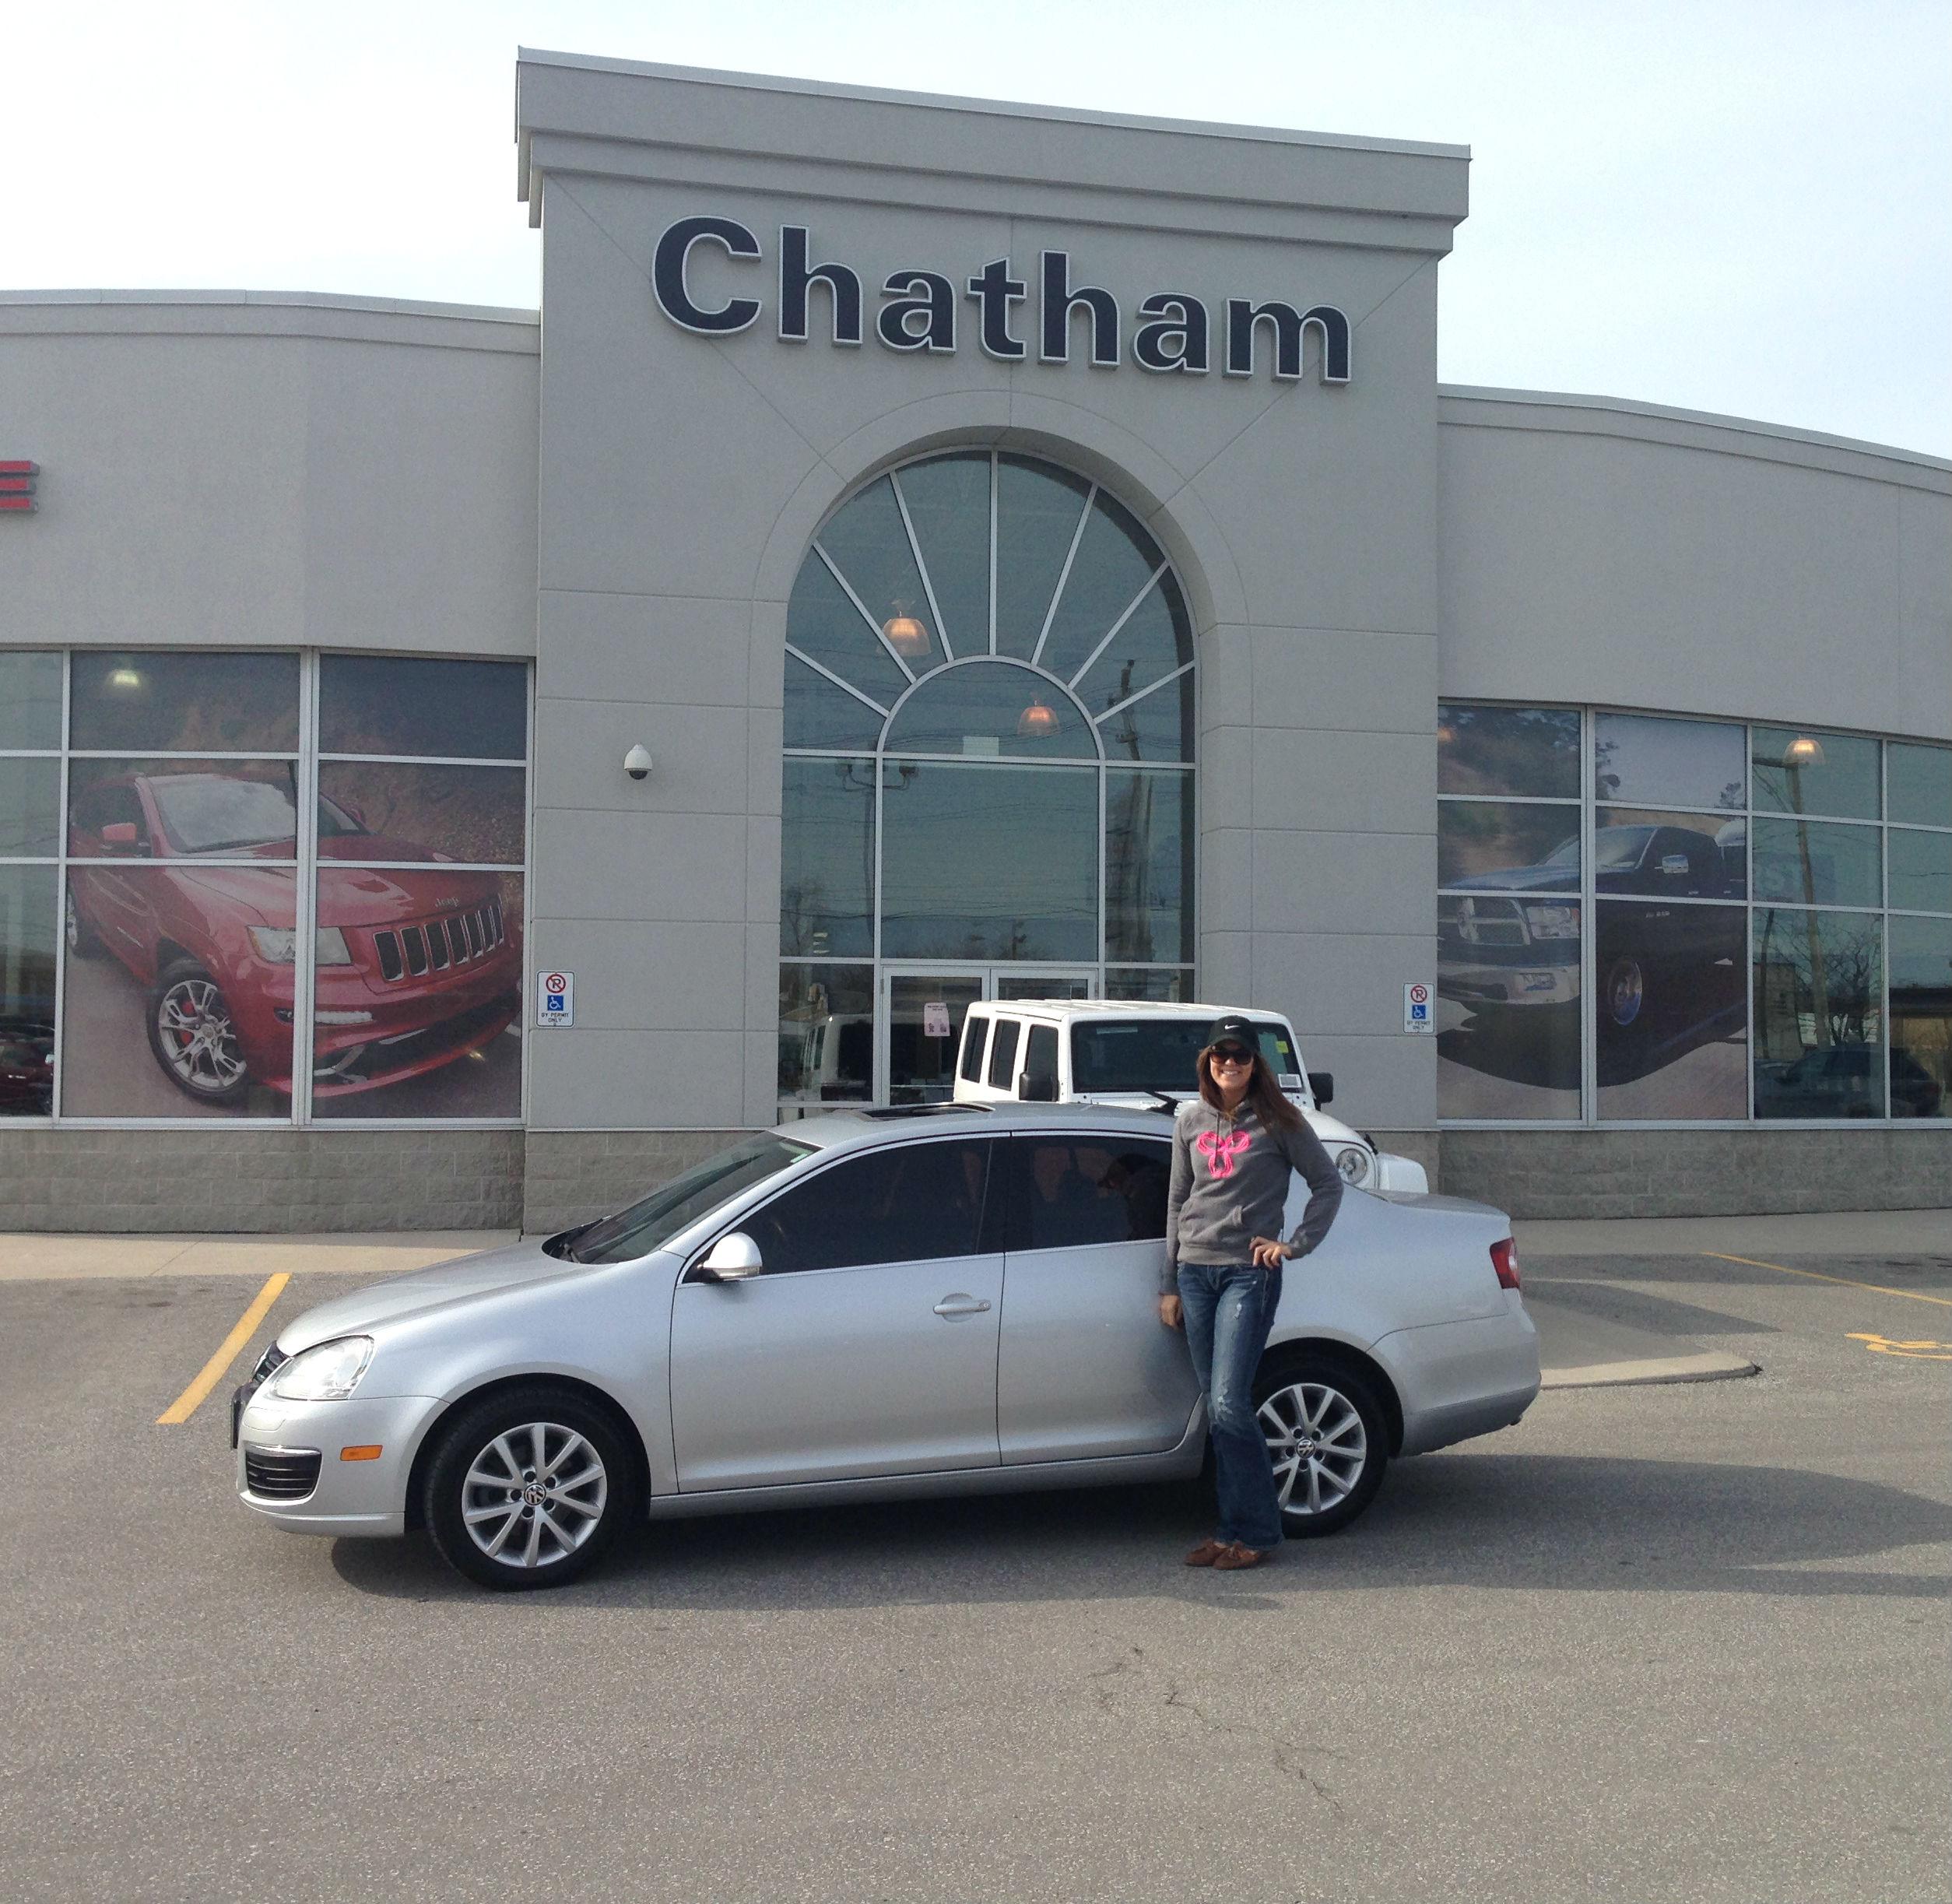 5 Star Jeep Dealers Colorado: Chatham Chrysler Dodge Jeep Ram